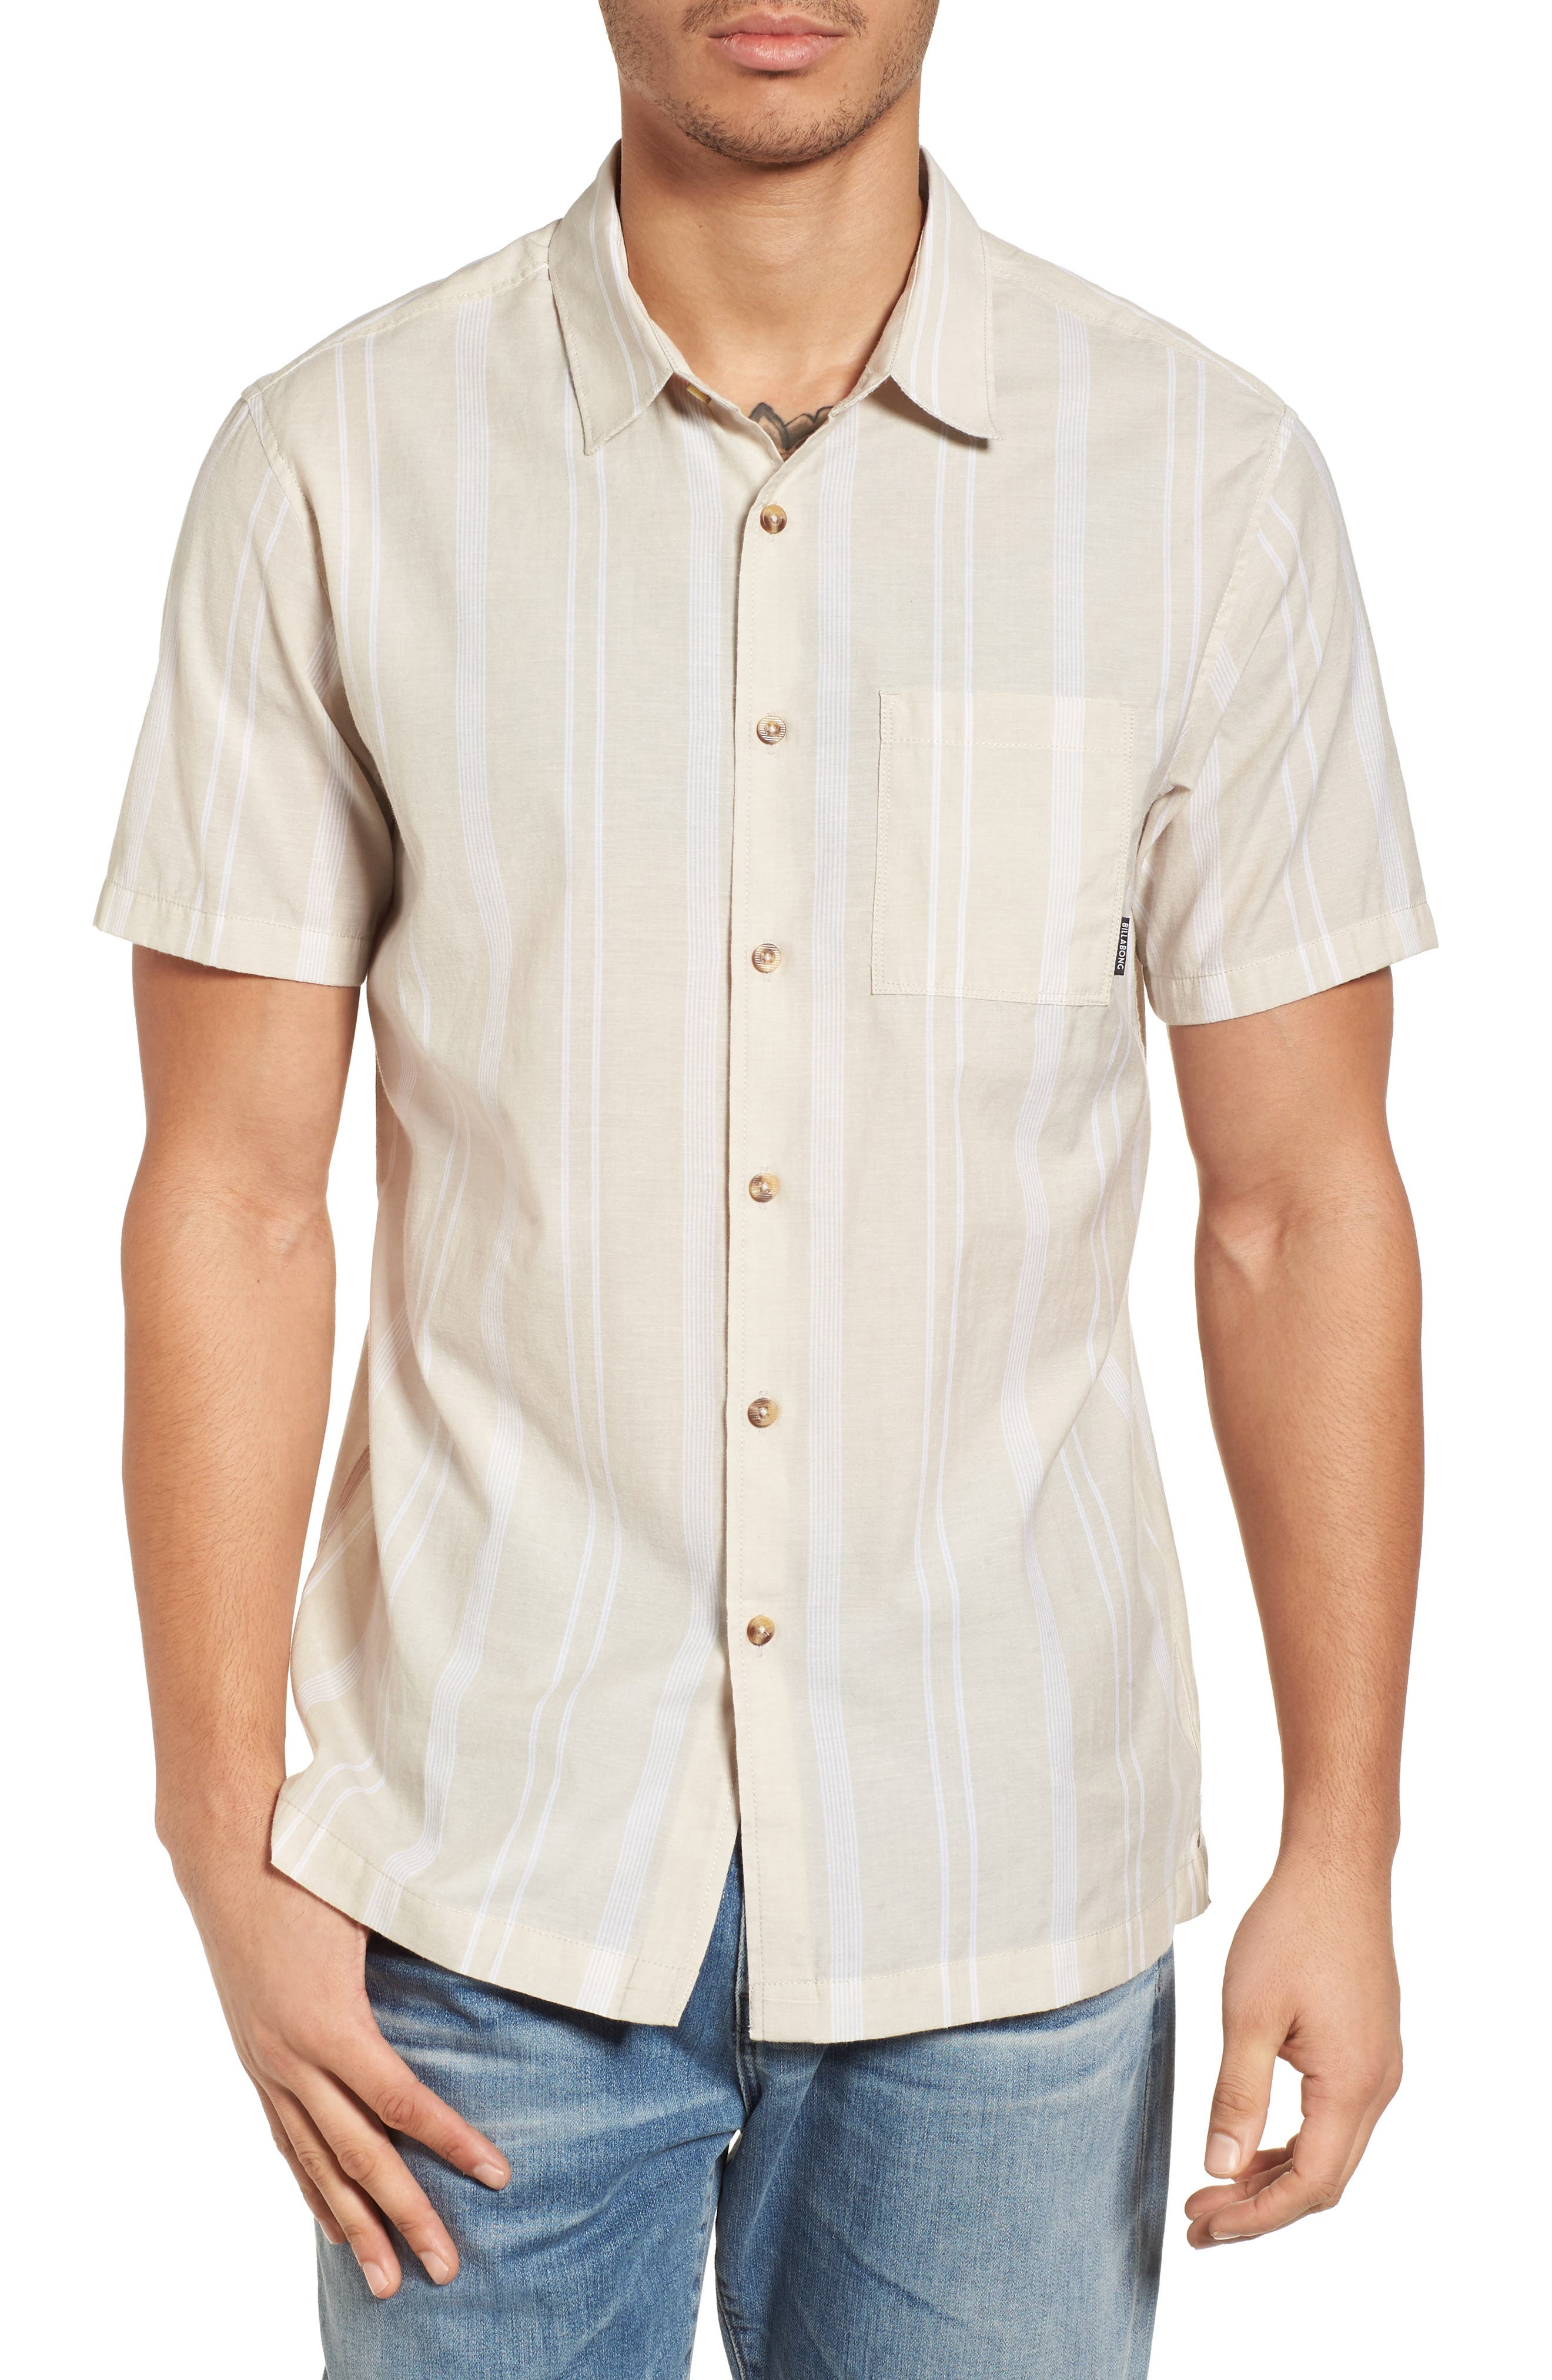 Alternate Image 1 Selected - Billabong Donny Short Sleeve Shirt